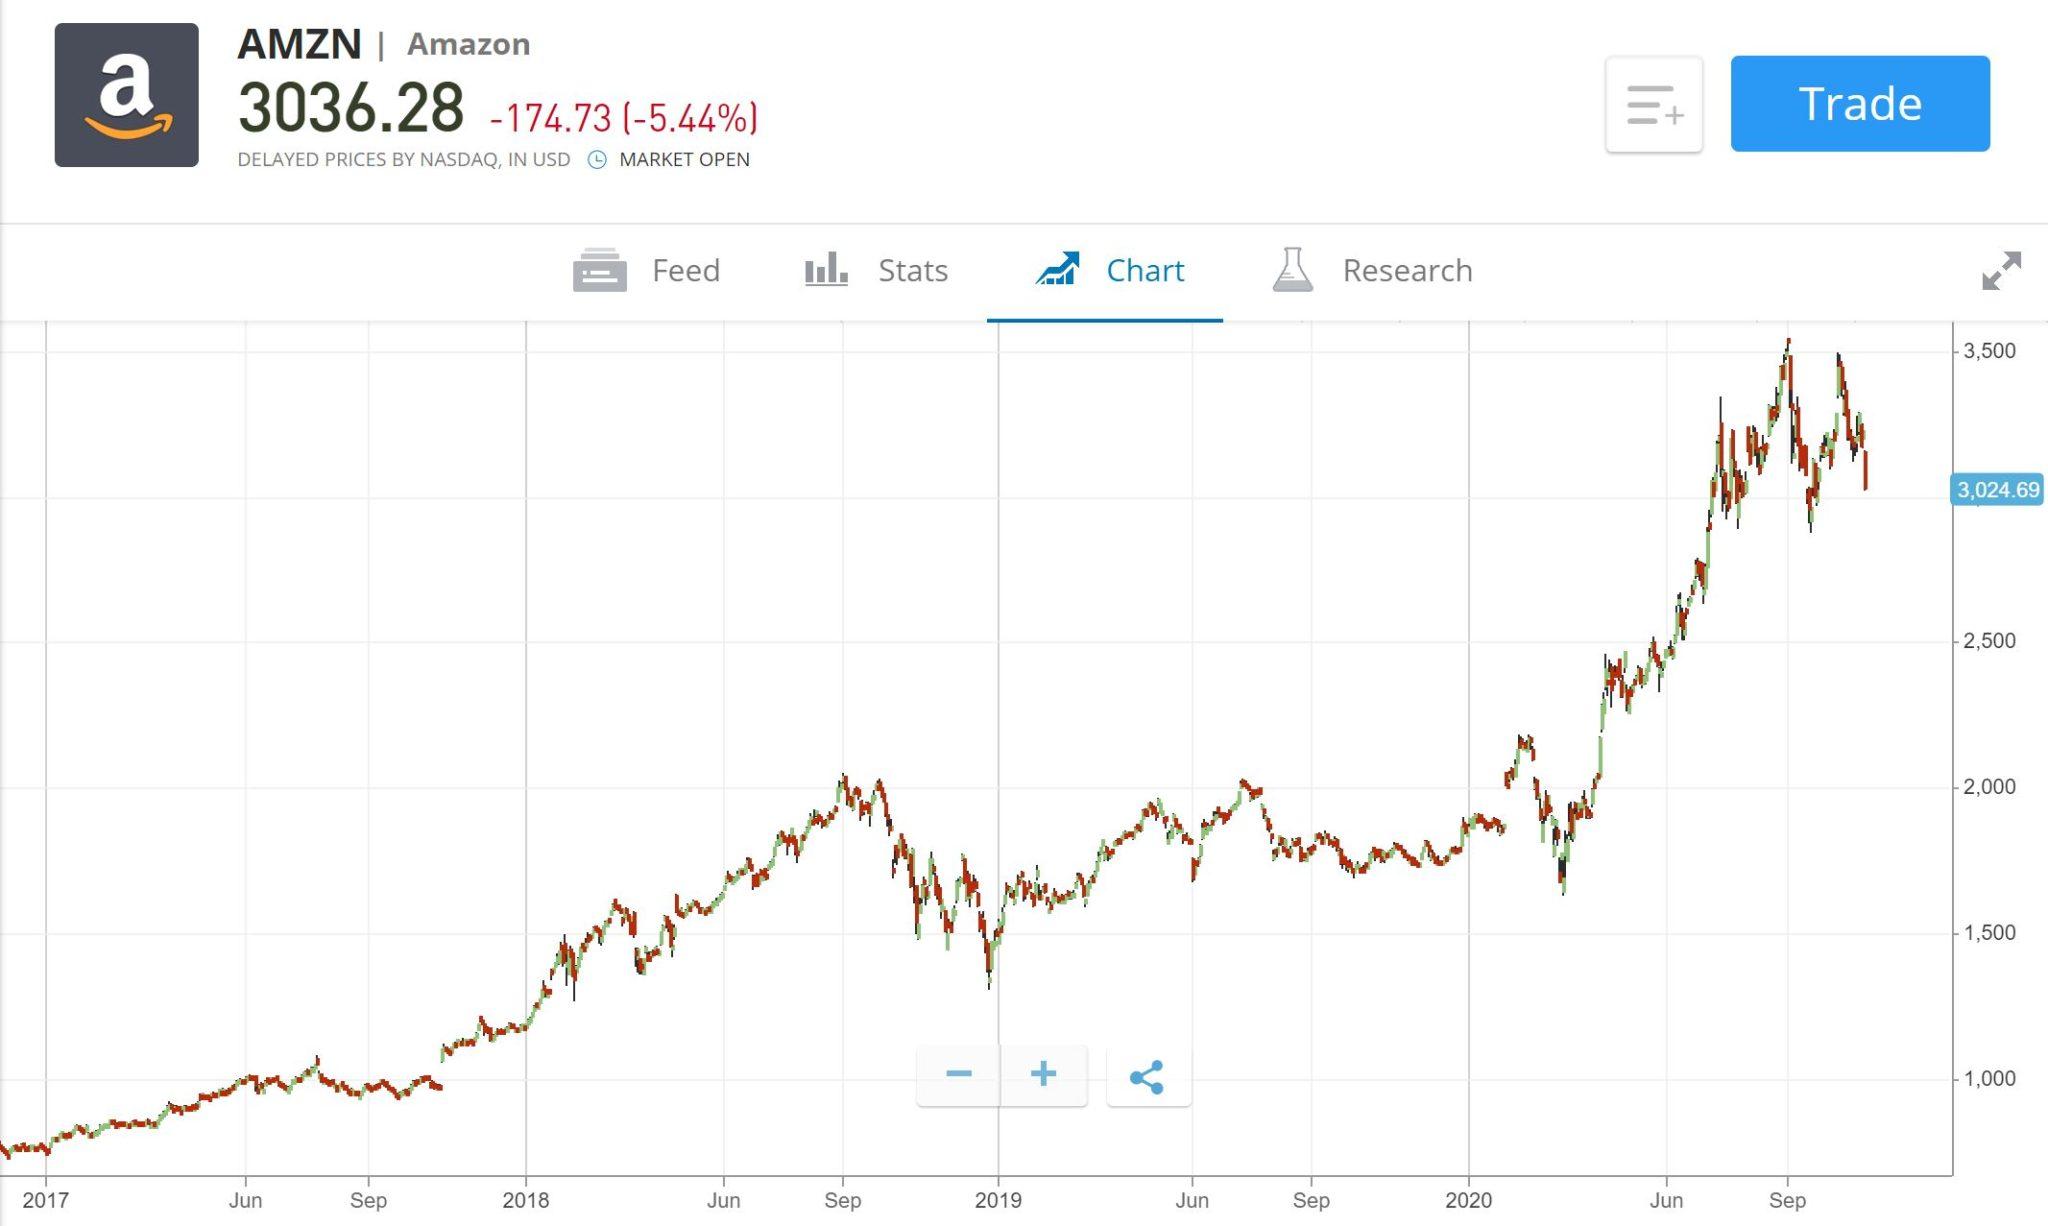 Amazon shares price chart